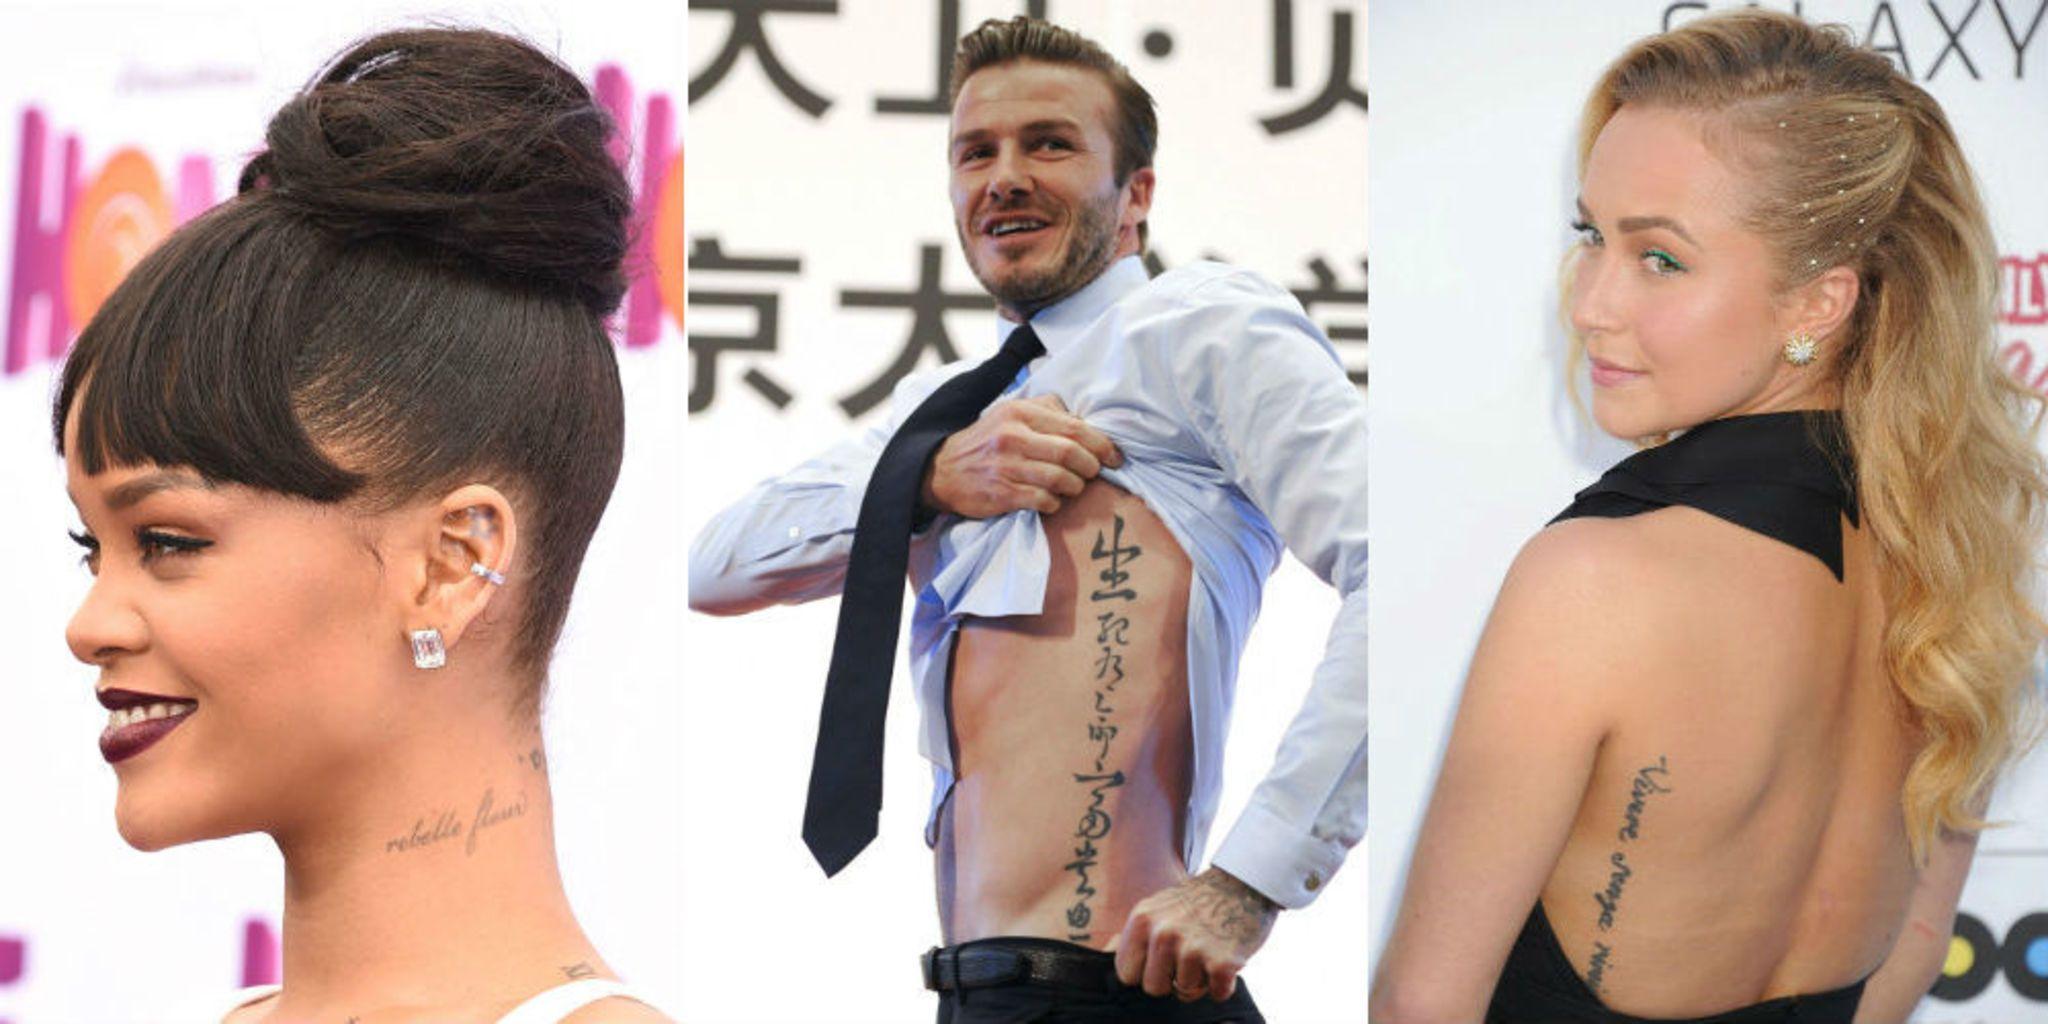 Dating piercings tatoeages